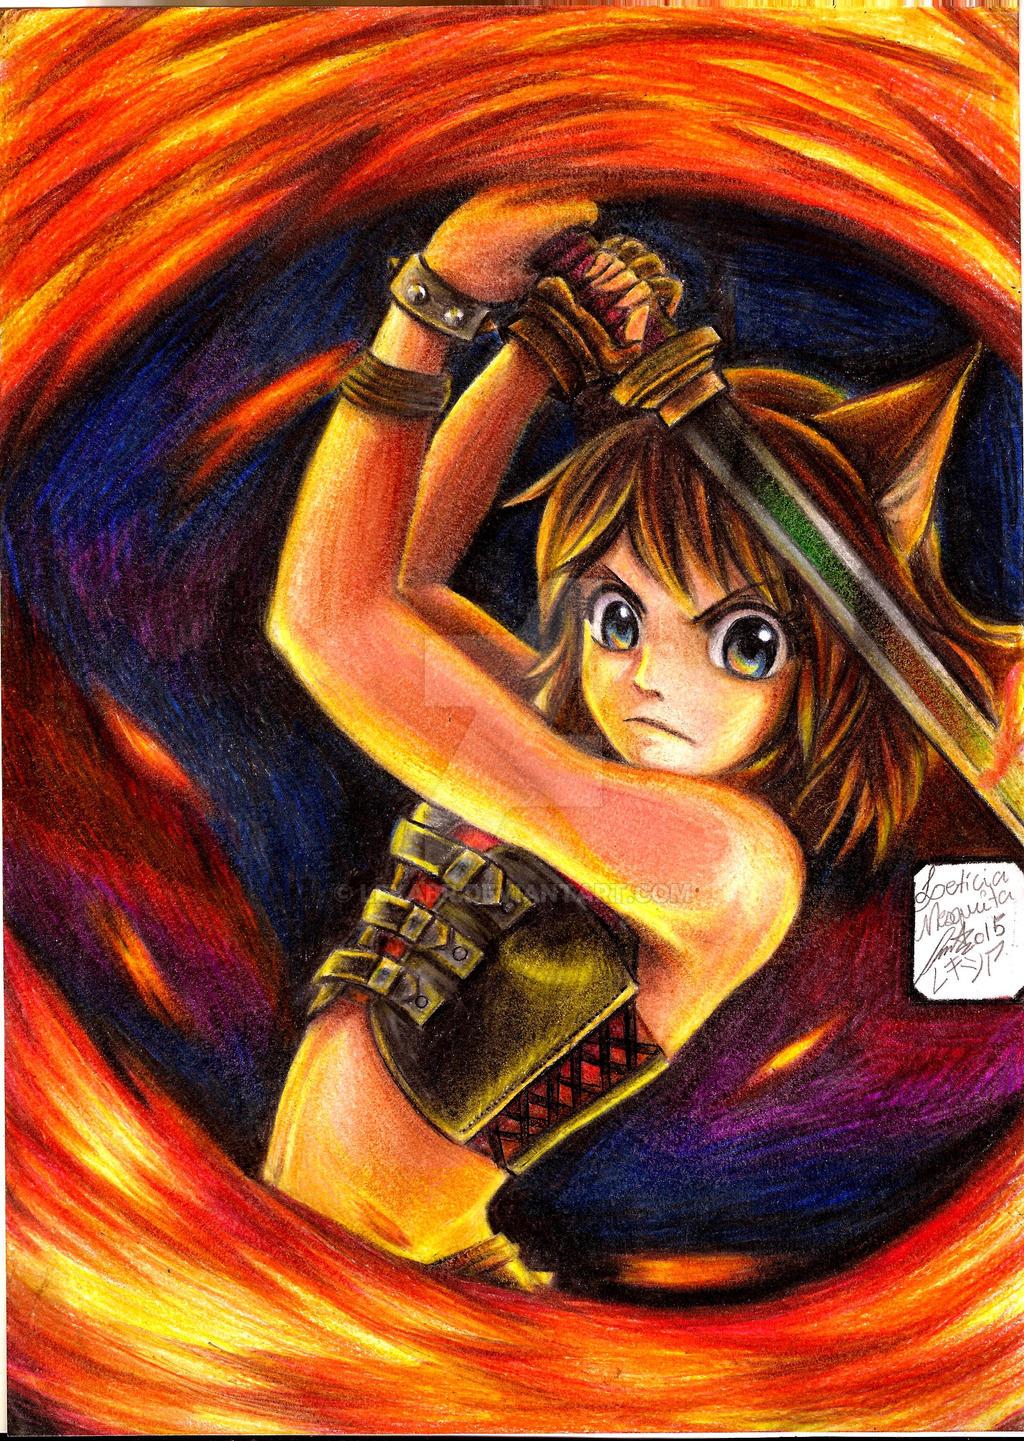 oc__lolo_kitsune___fire_spin_by_lekabr-d